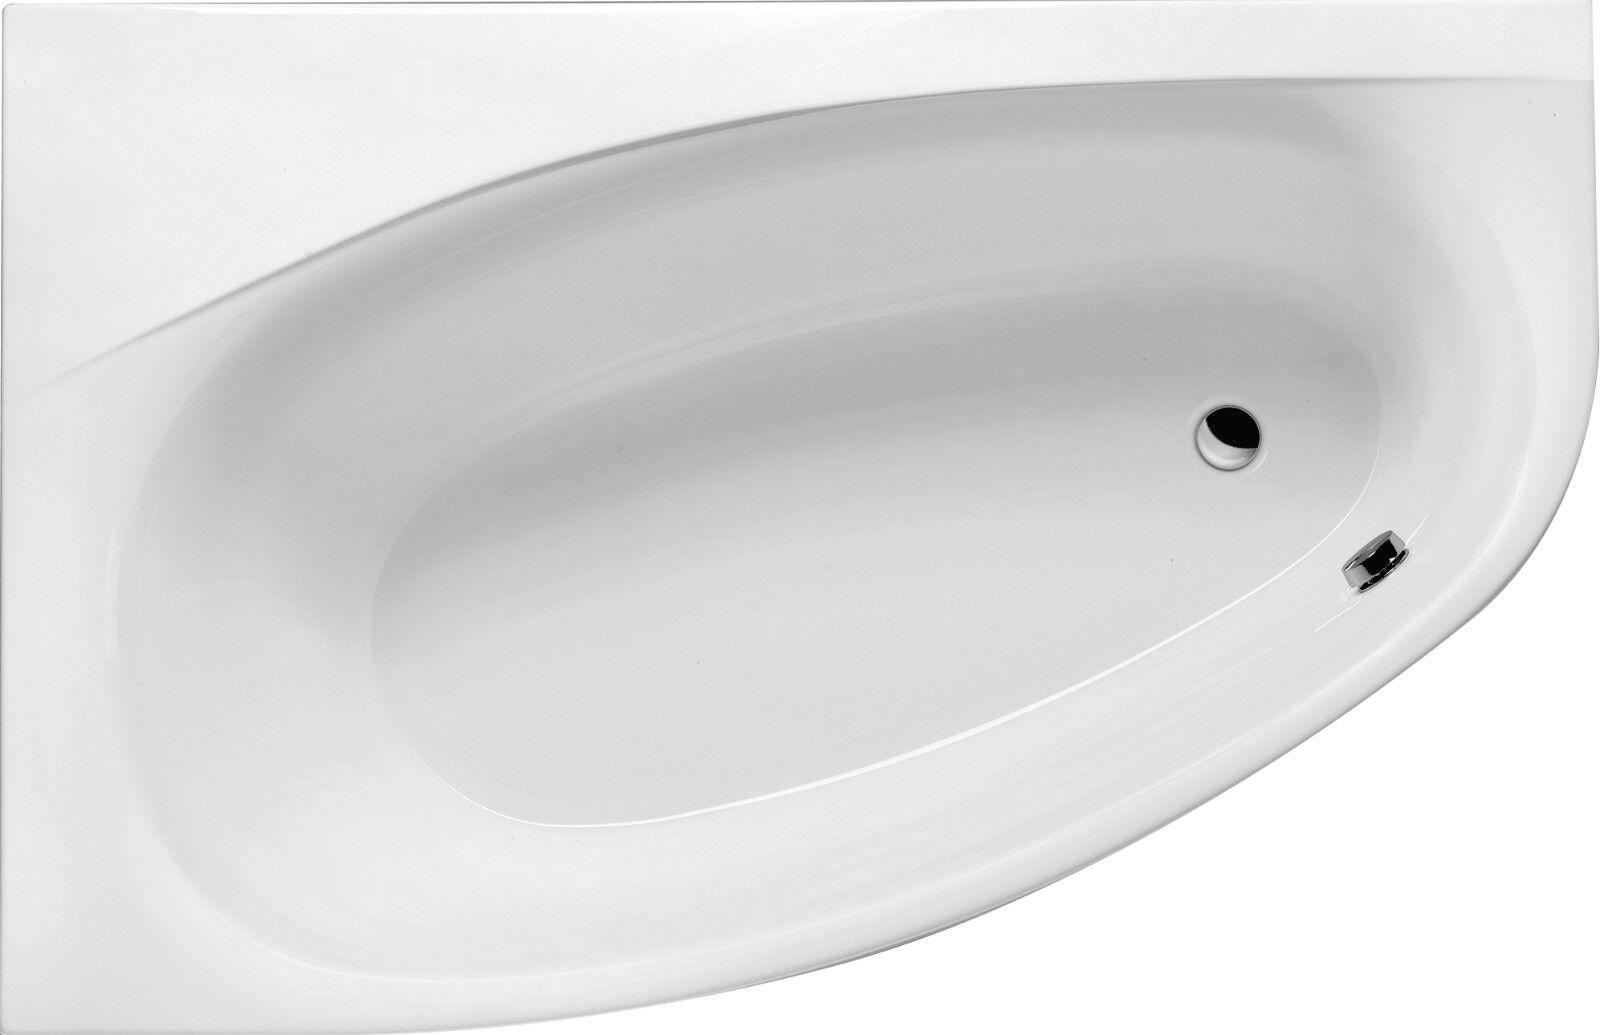 Raumspar-Badewanne Kameleon 170 x 110 x 46 cm rechte oder linke Variante